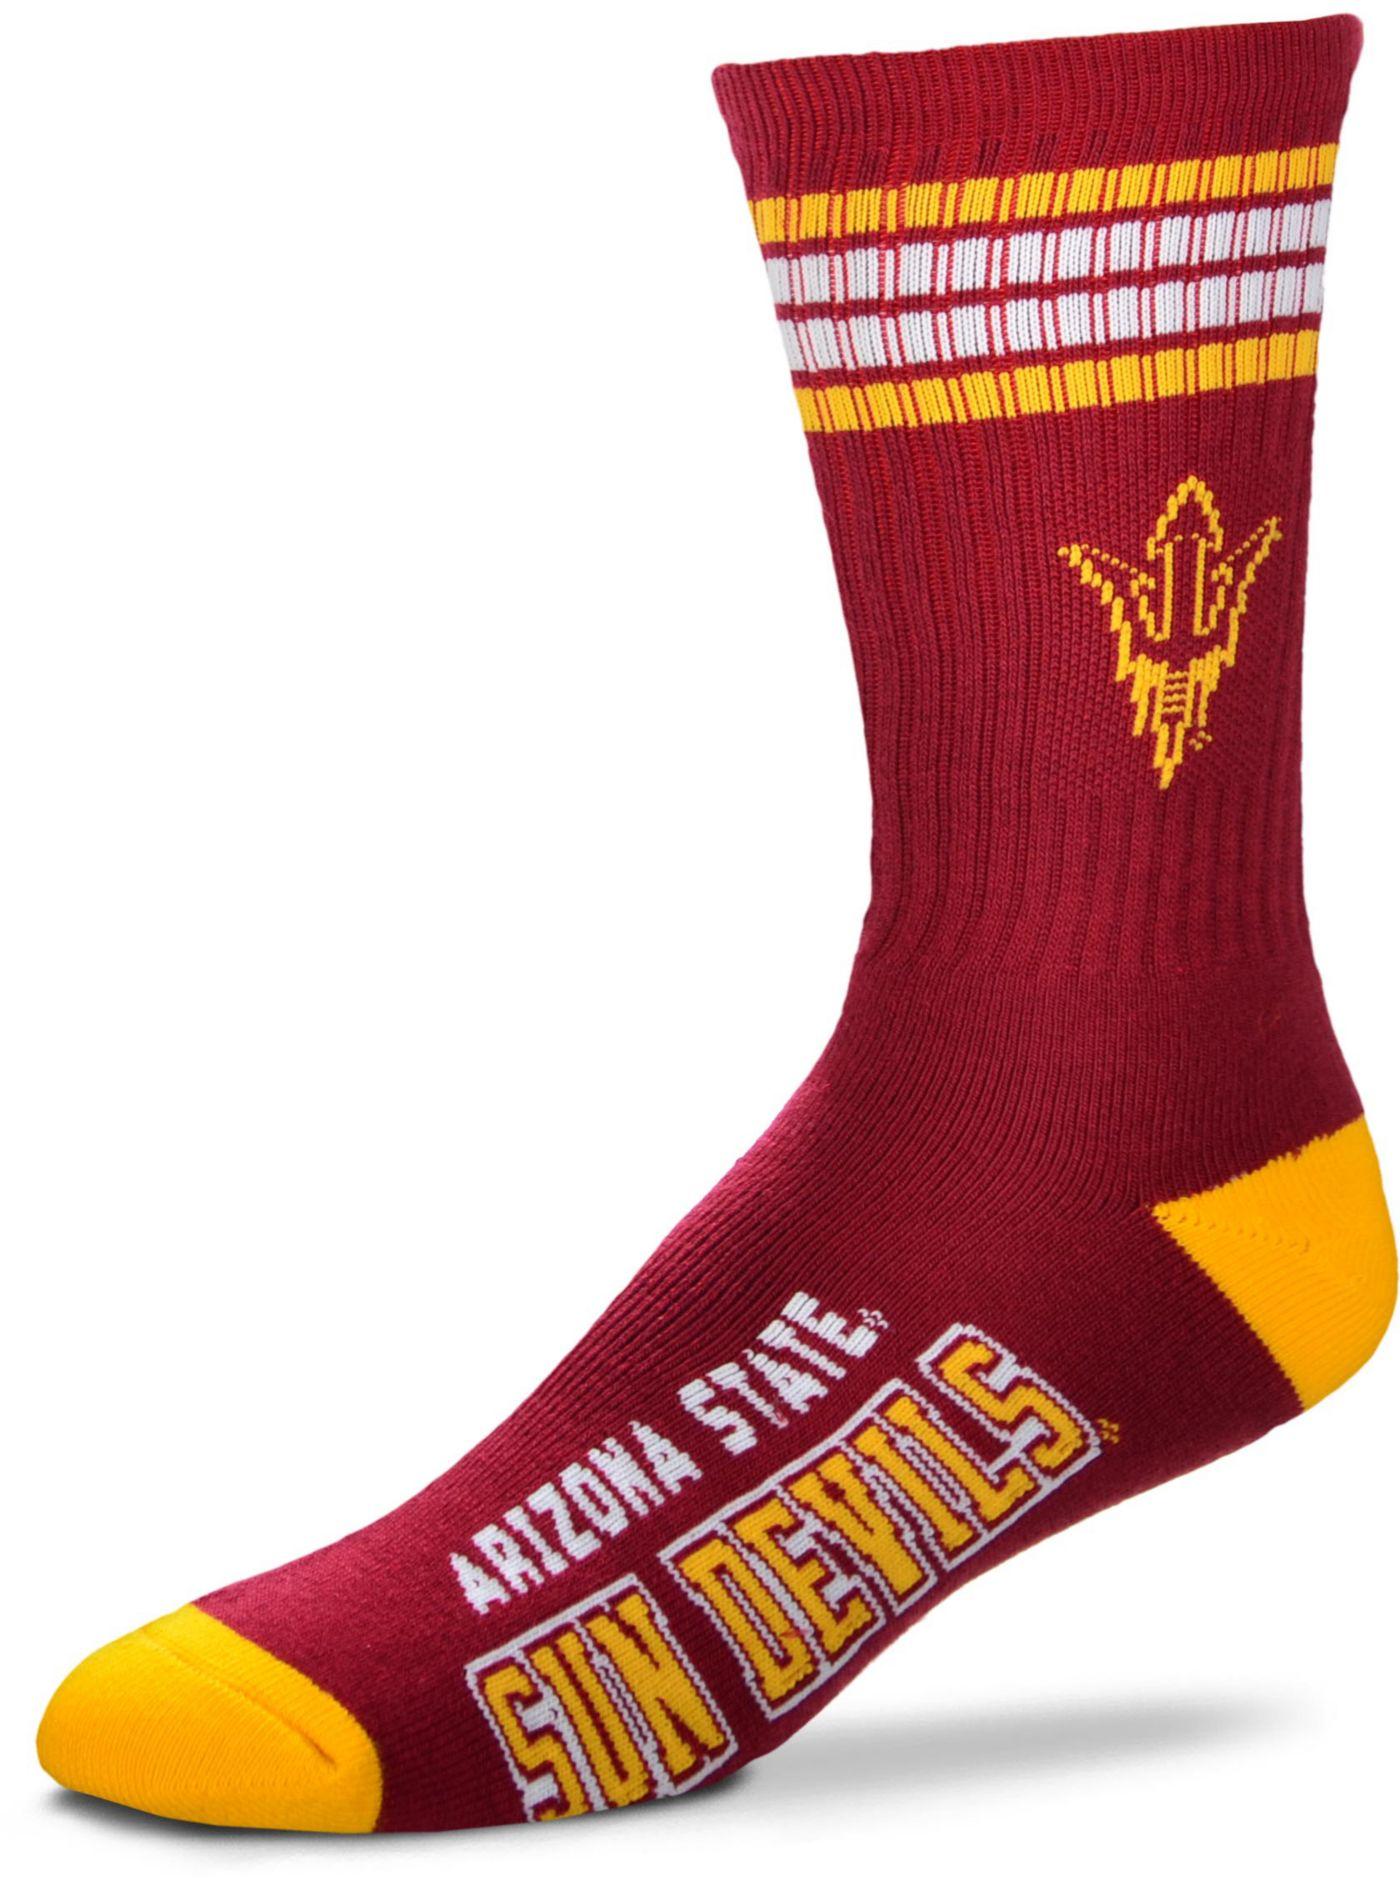 For Bare Feet Arizona State Sun Devils 4-Stripe Deuce Crew Socks